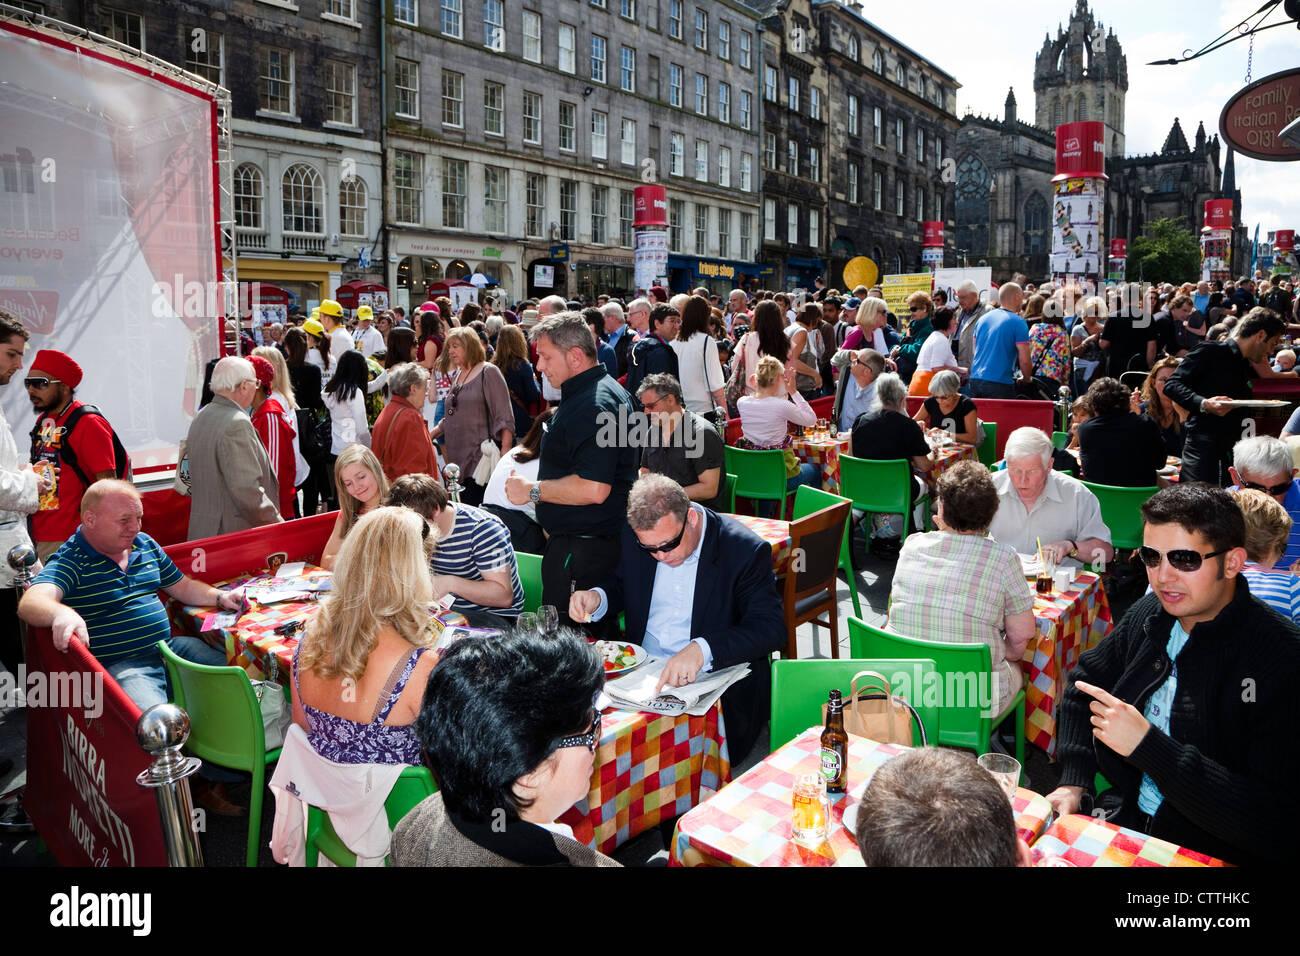 High Street, Edinburgh, with cafés and bars, during the Edinburgh festival, Scotland, UK, Great Britain - Stock Image